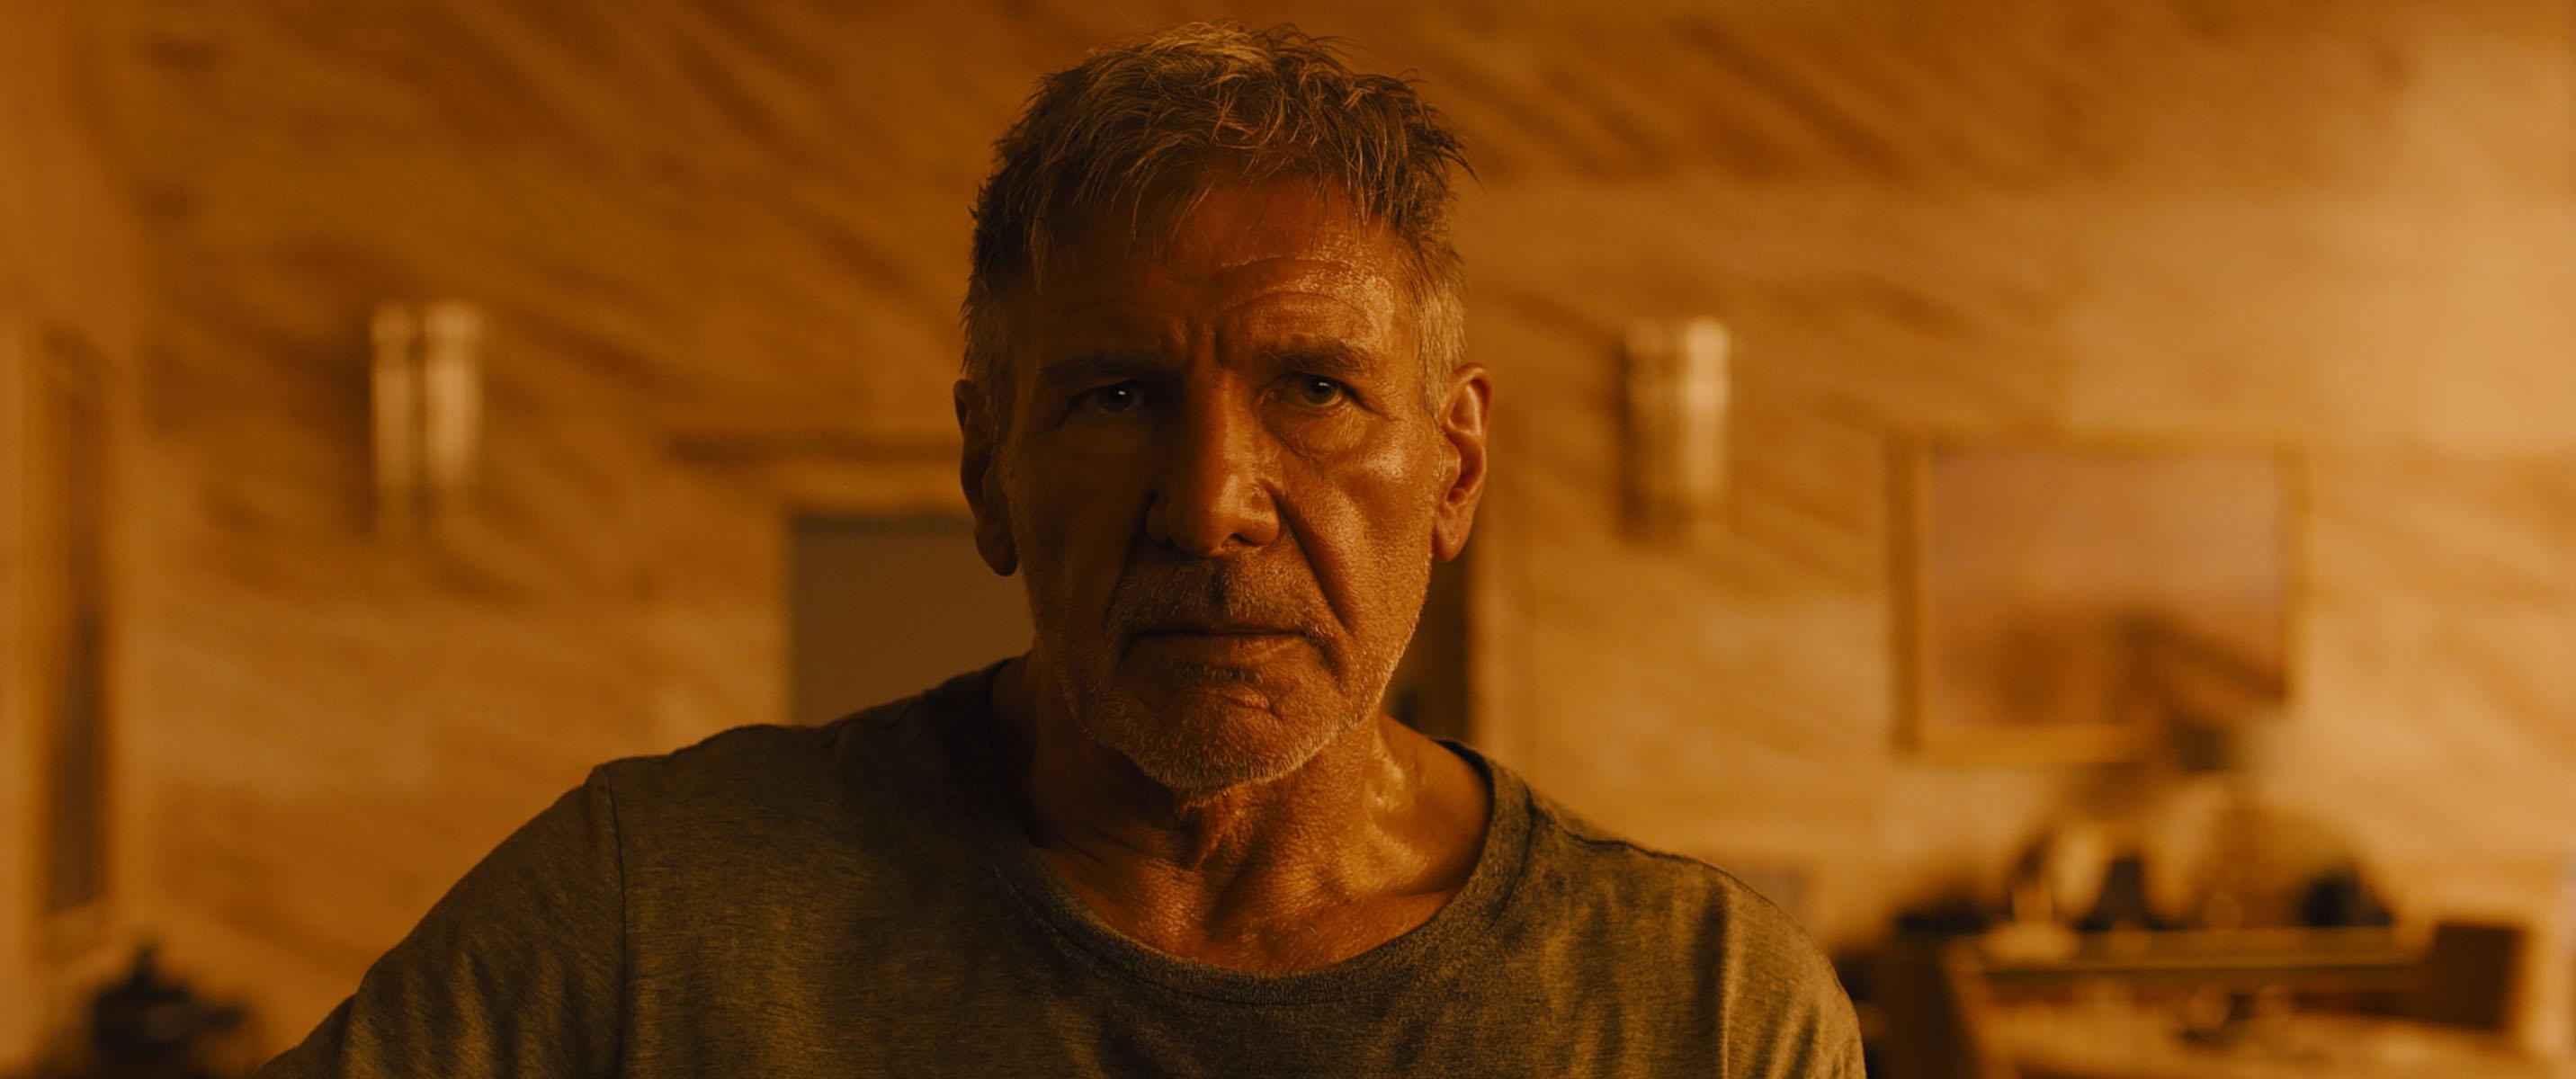 wallpaper : blade runner 2049, movies, men, actor, harrison ford